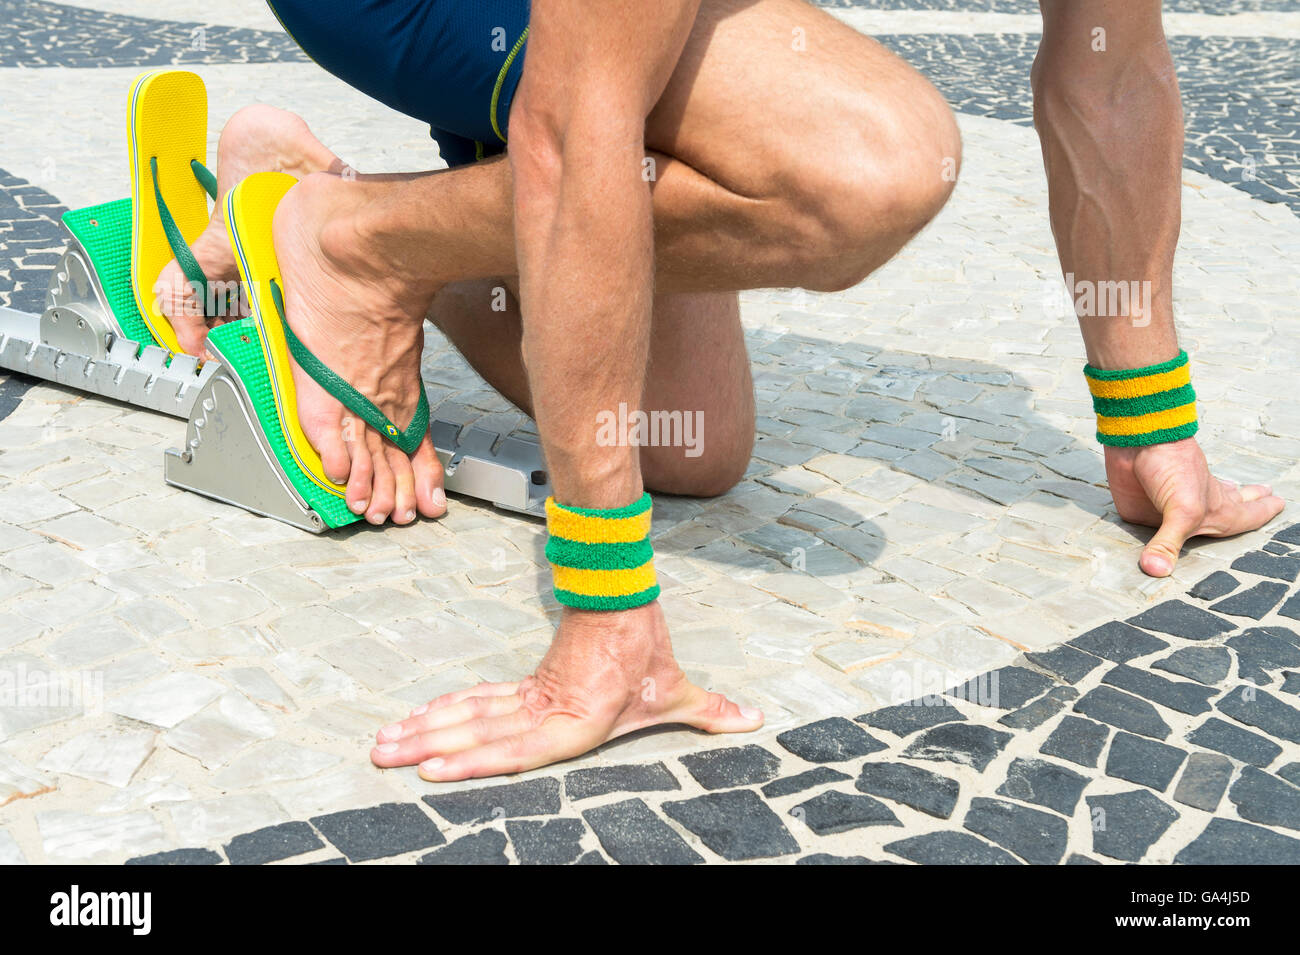 886c102455b92b Brazilian athlete wearing flip flops crouching at the start position in running  blocks on the tiles of the Copacabana boardwalk